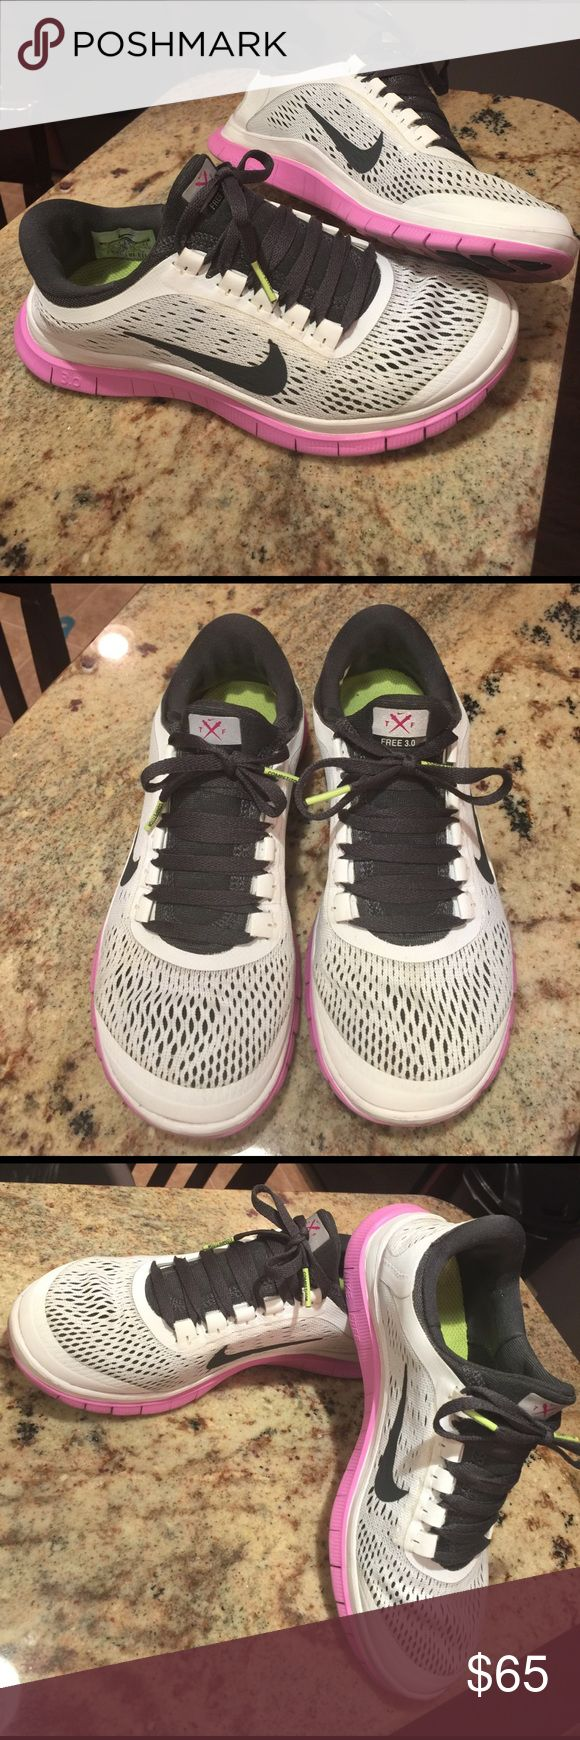 Nike Free 3.0 Pink white/grayish Nike free 3.0. Size 7. Good shape! I don't have the original box. Nike Shoes Athletic Shoes